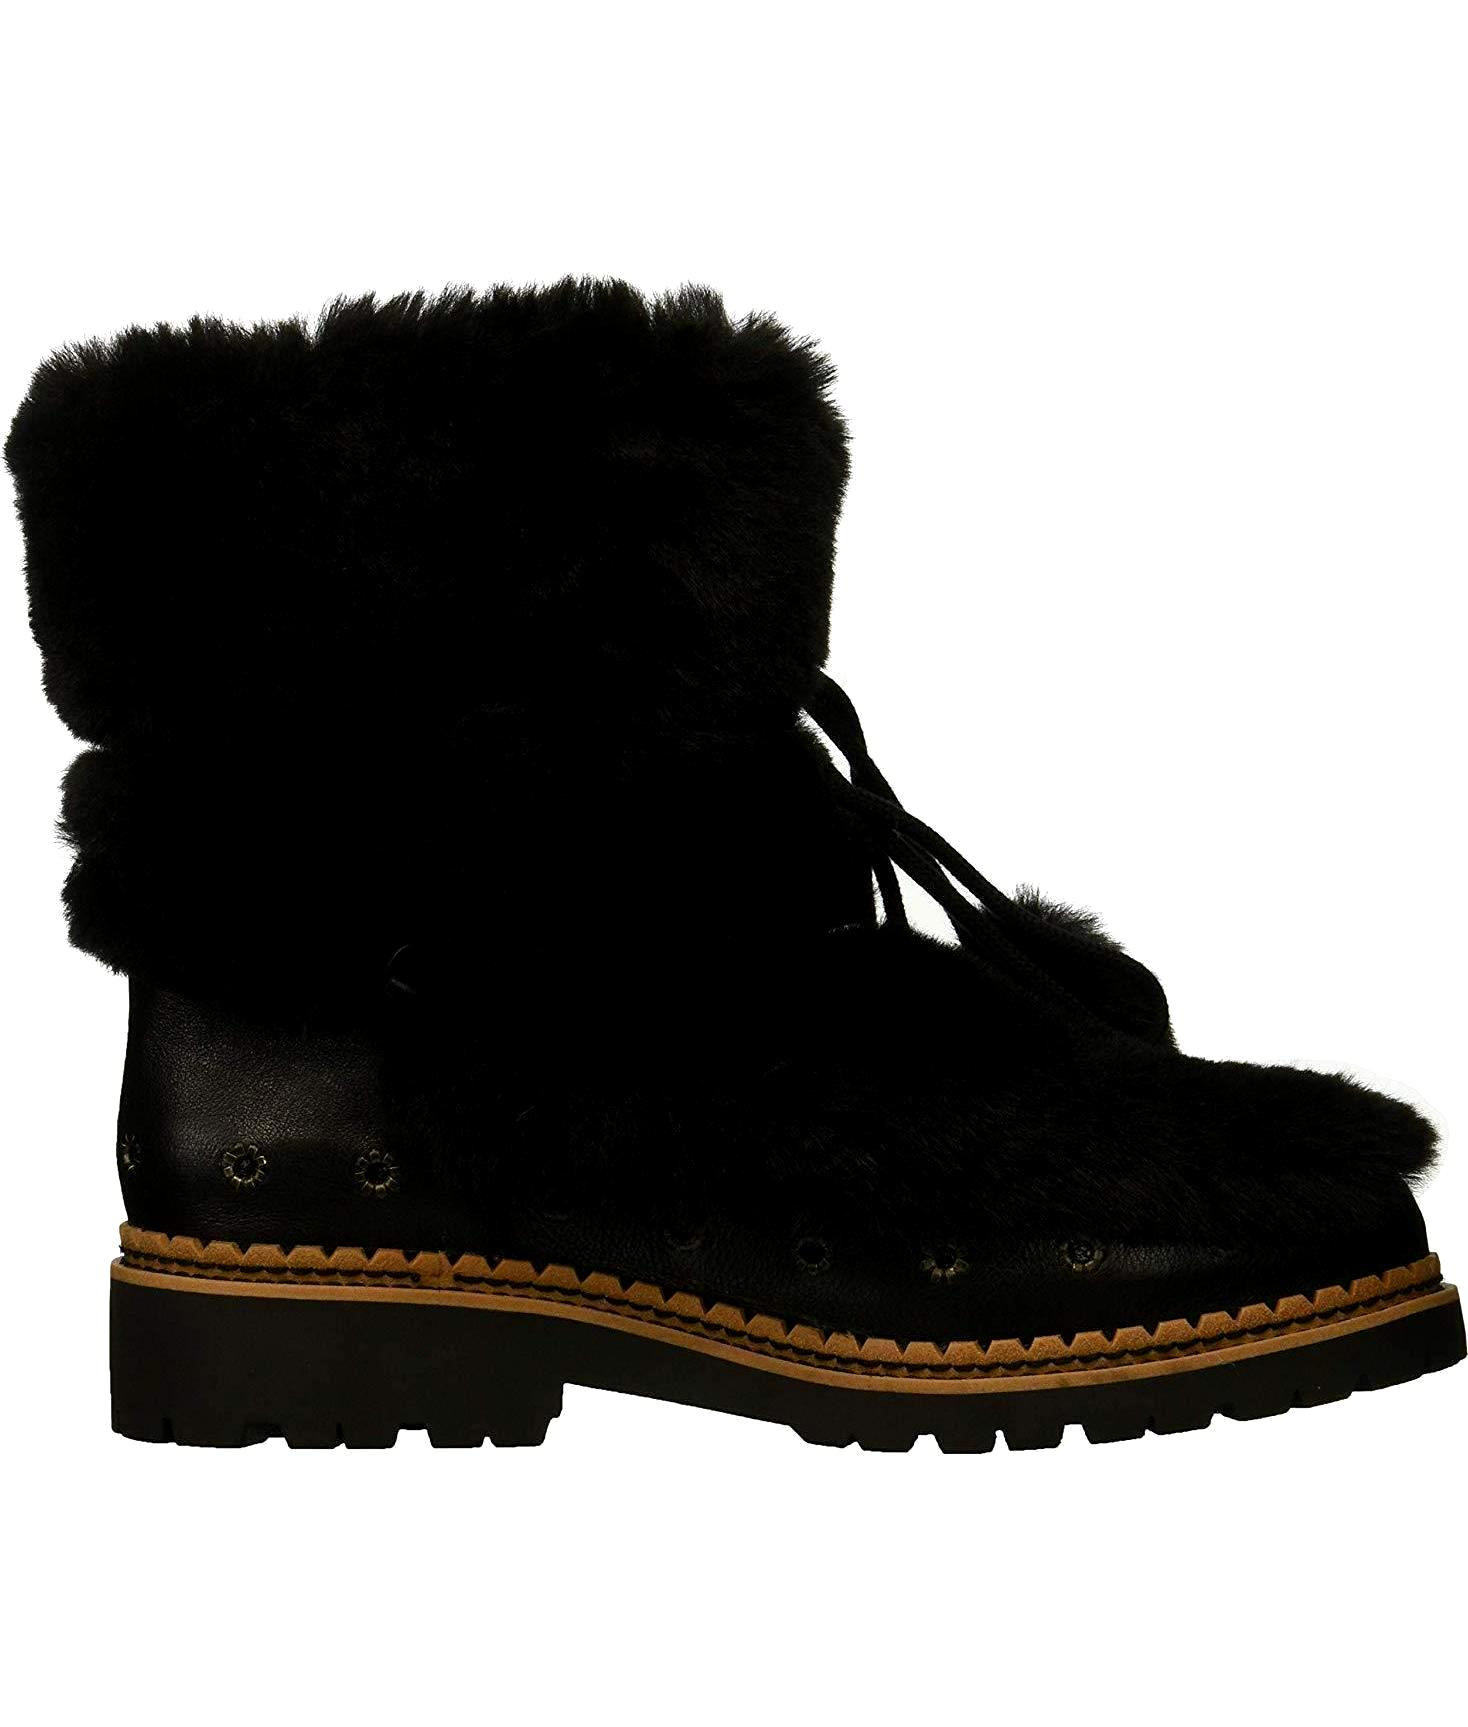 7f9271c0306aca Sam Edelman Women s Blanche Fashion Boot in Black